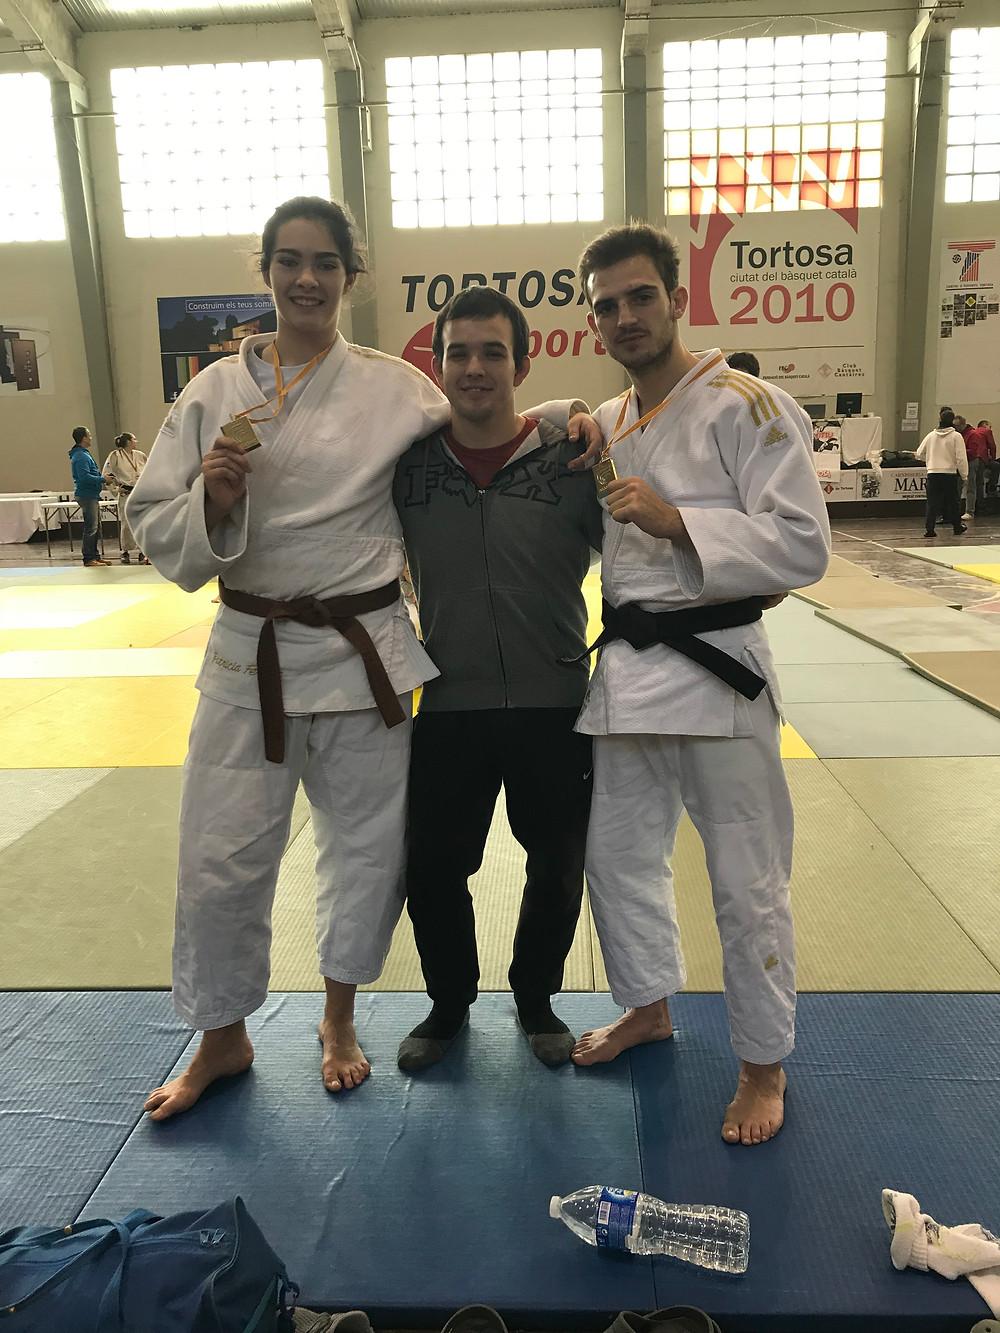 Patri, Dani y Raúl Oros en Tortosa